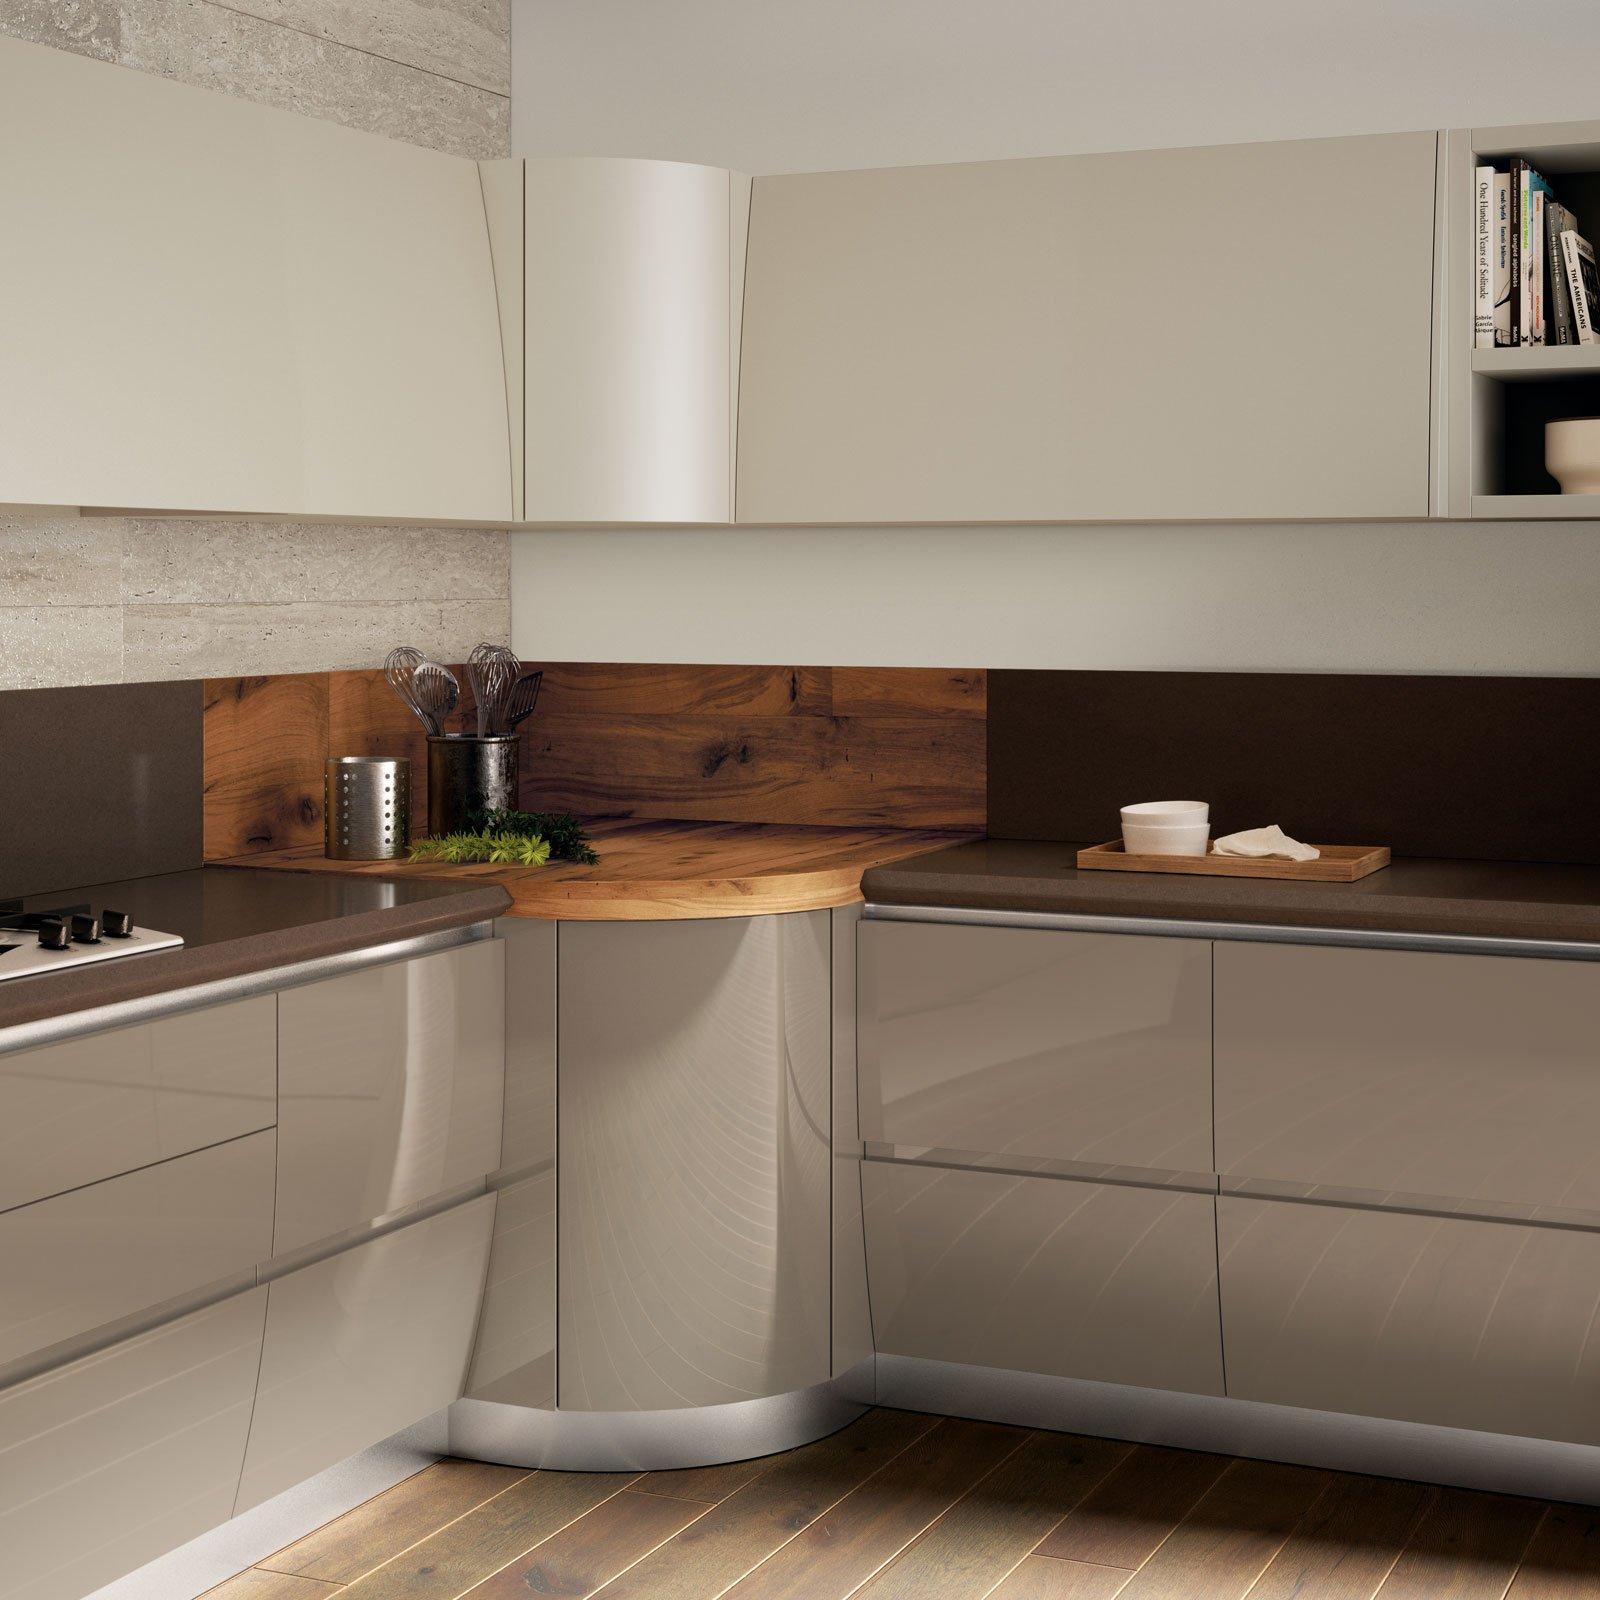 Sfruttare l 39 angolo in cucina cose di casa - Cucina in casa ...